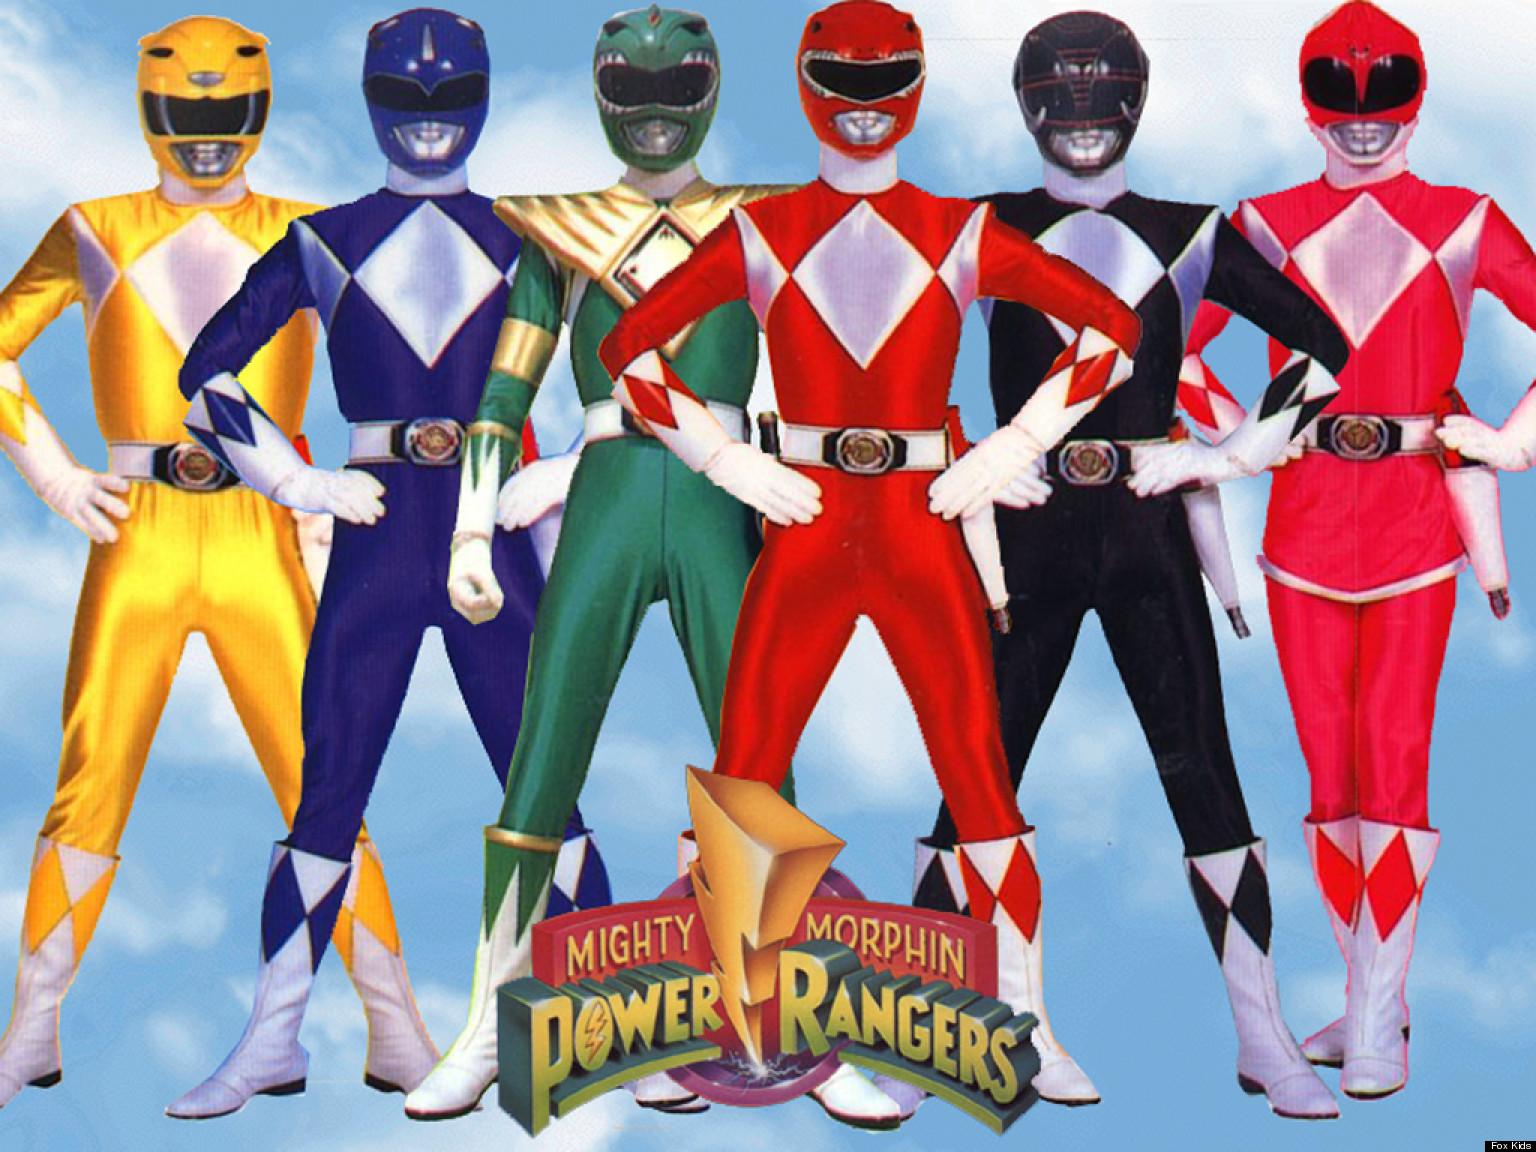 power rangers reunion drama david yost and walter jones not participating